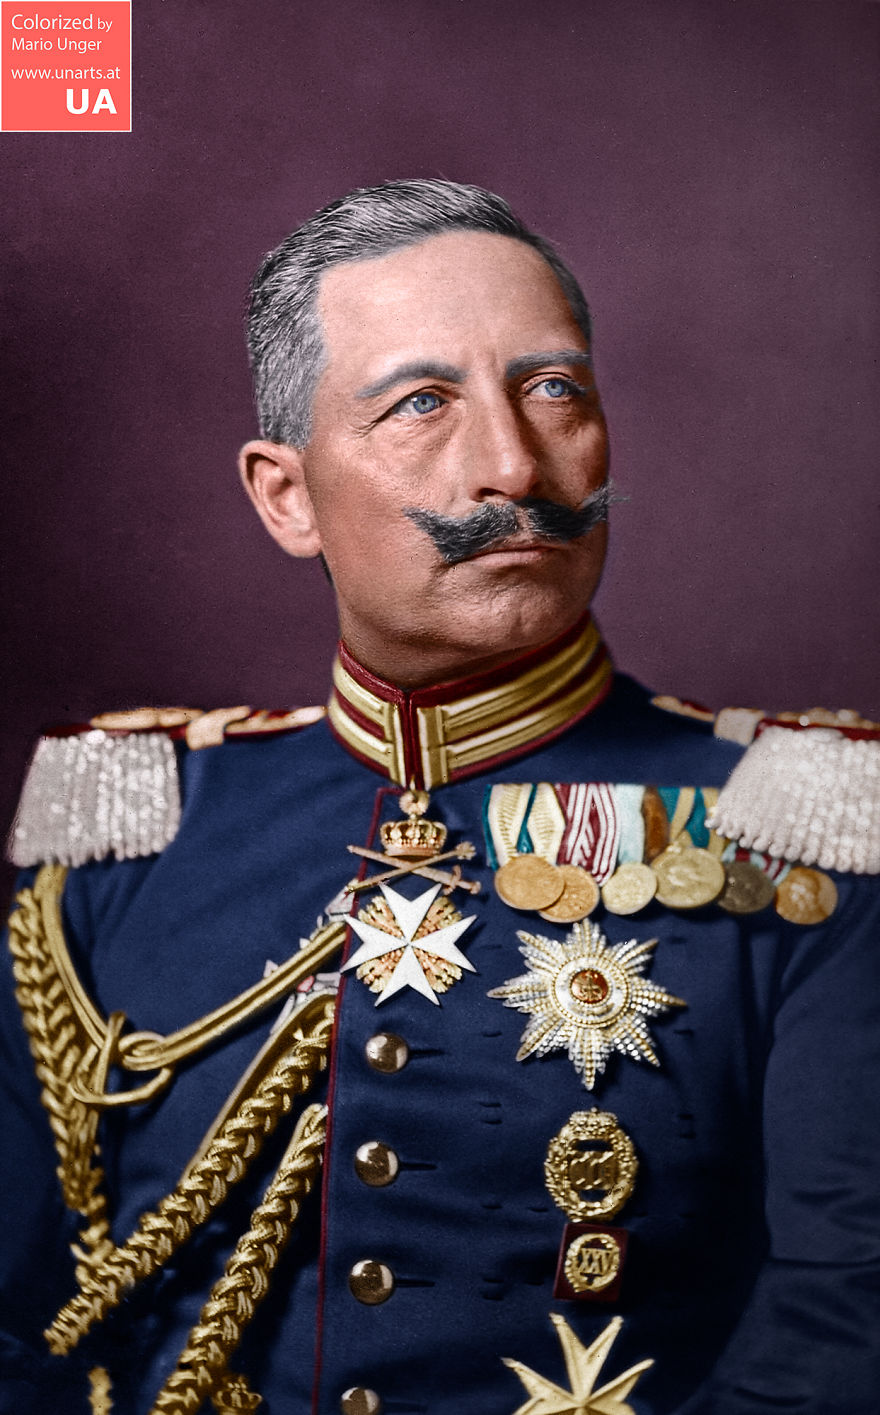 Kaiser Wilhelm II From Germany